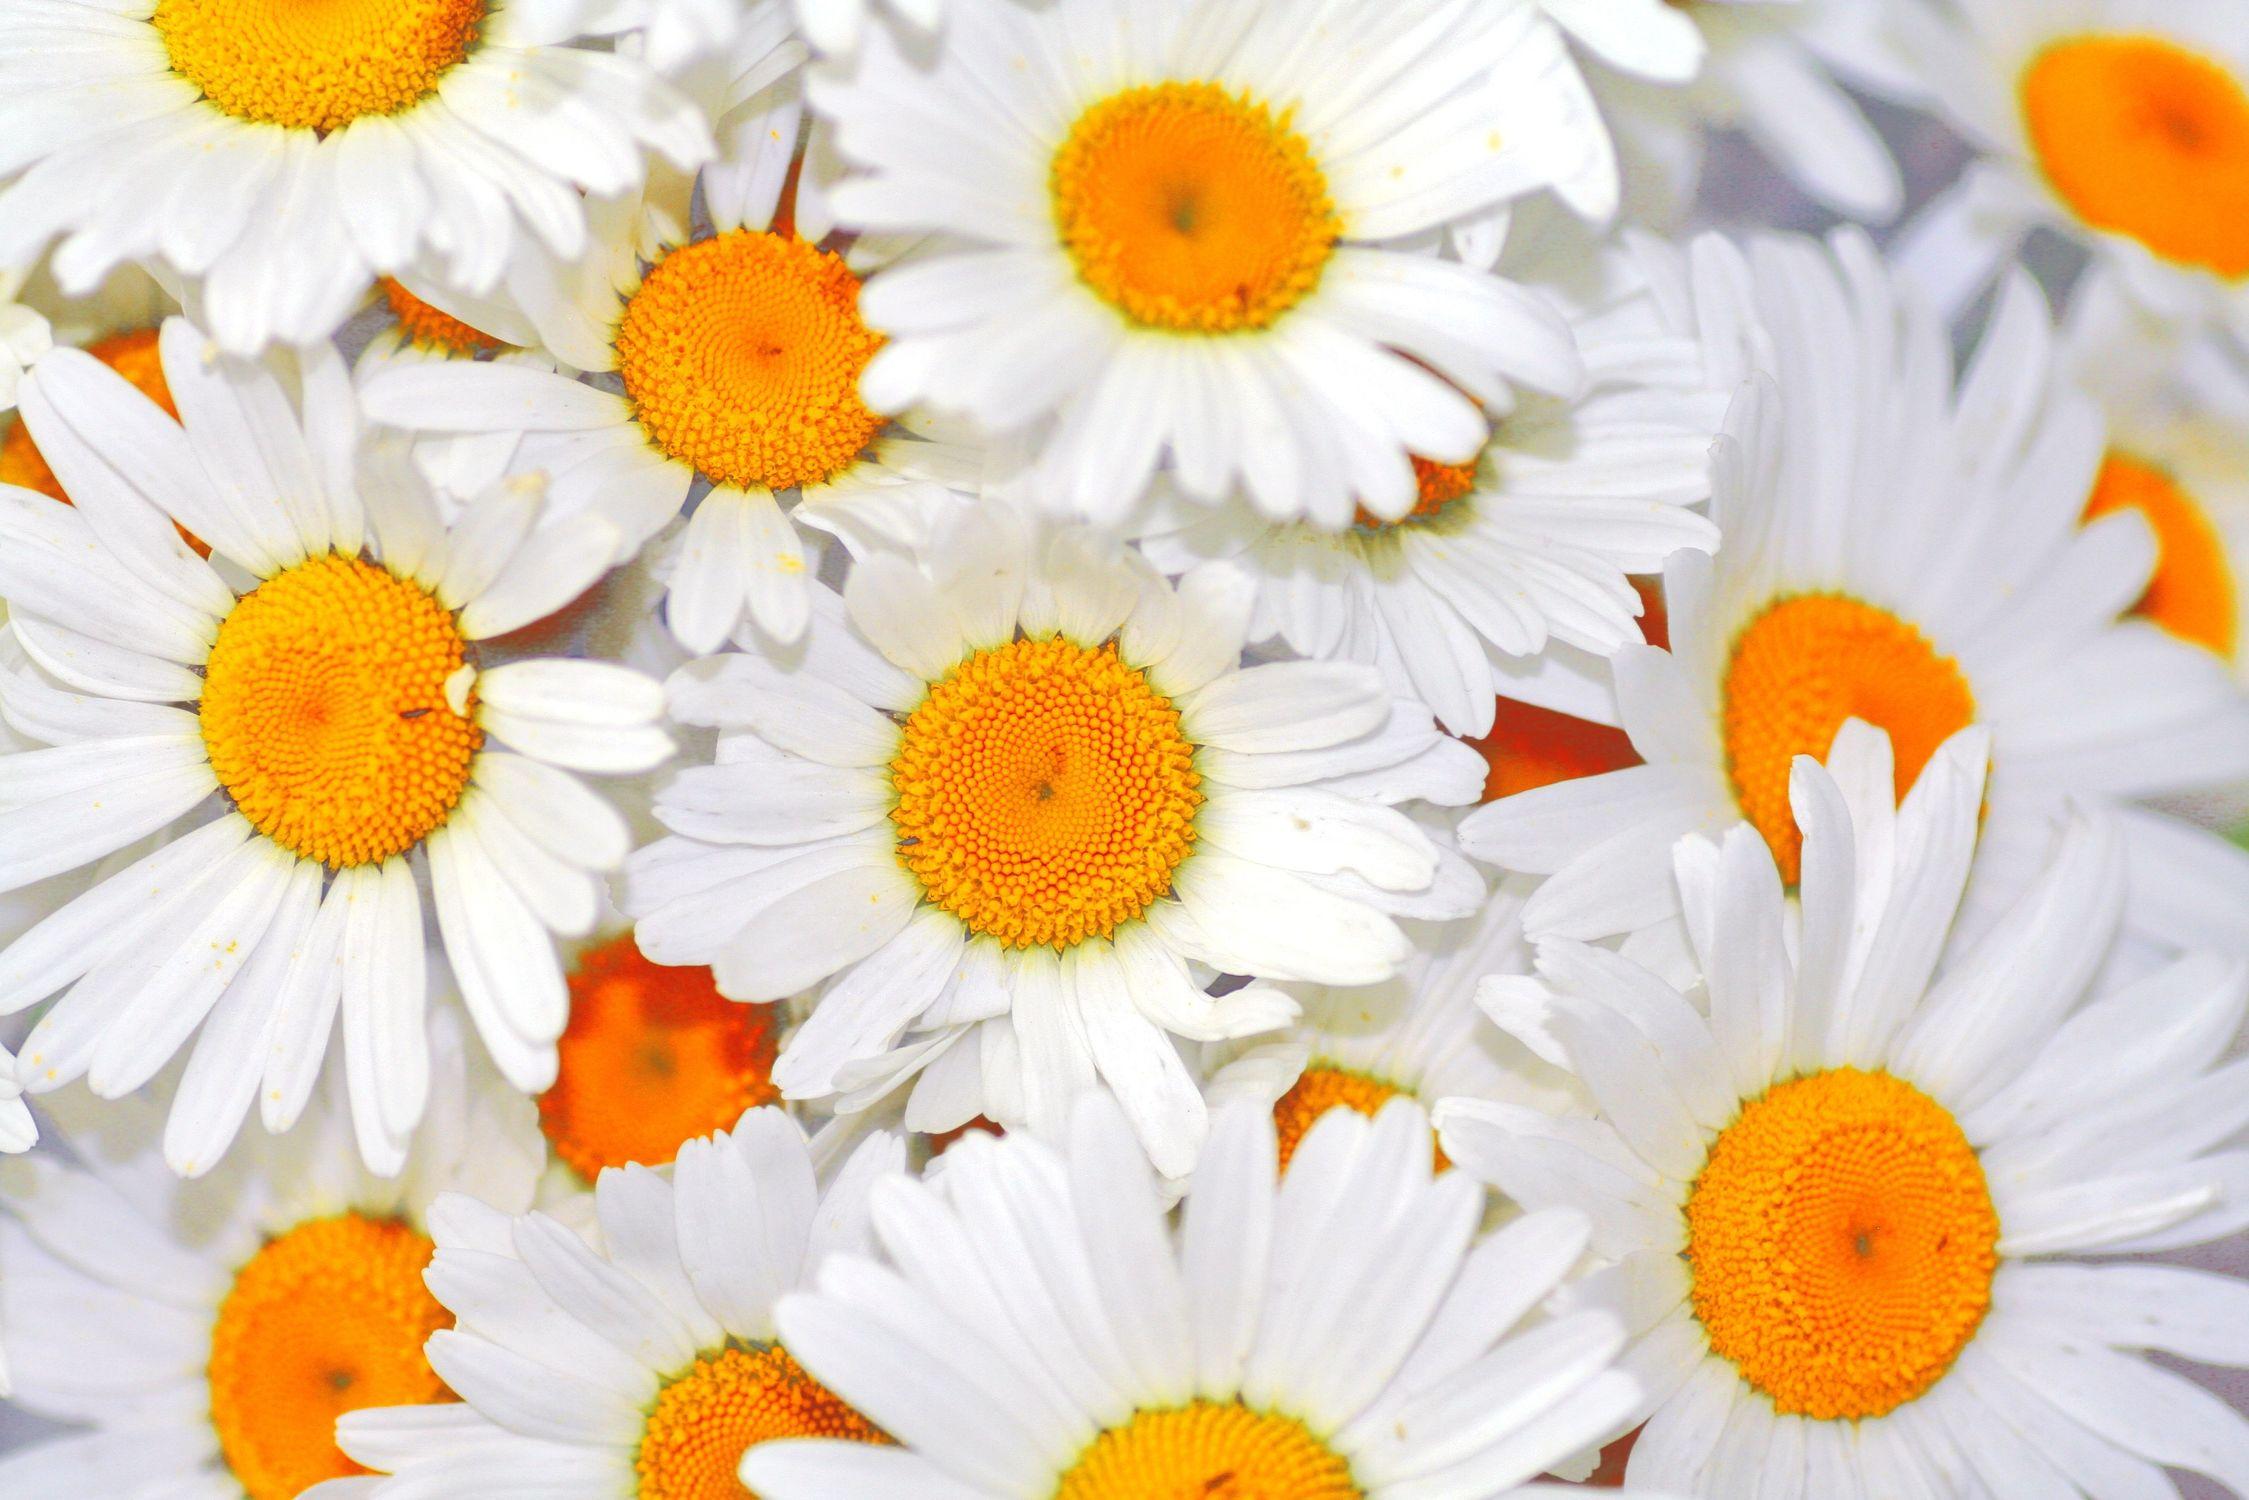 Bild mit Natur, Pflanzen, Blumen, Korbblütler, Gerberas, Kamillen, Blume, Pflanze